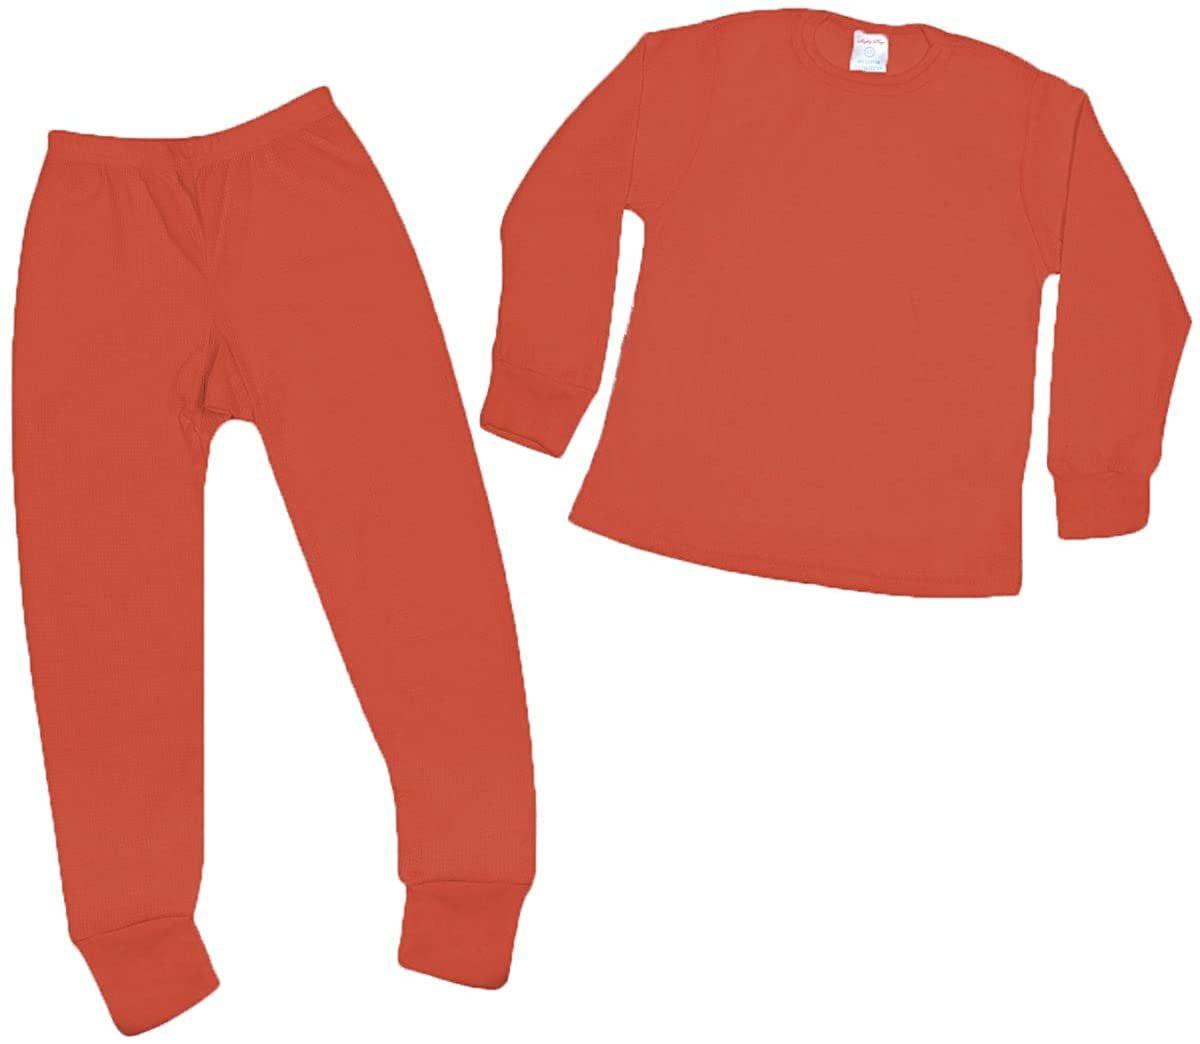 Premium Boys Thermal Underwear Set Waffle Knit Warm /& High Moisture Wicking